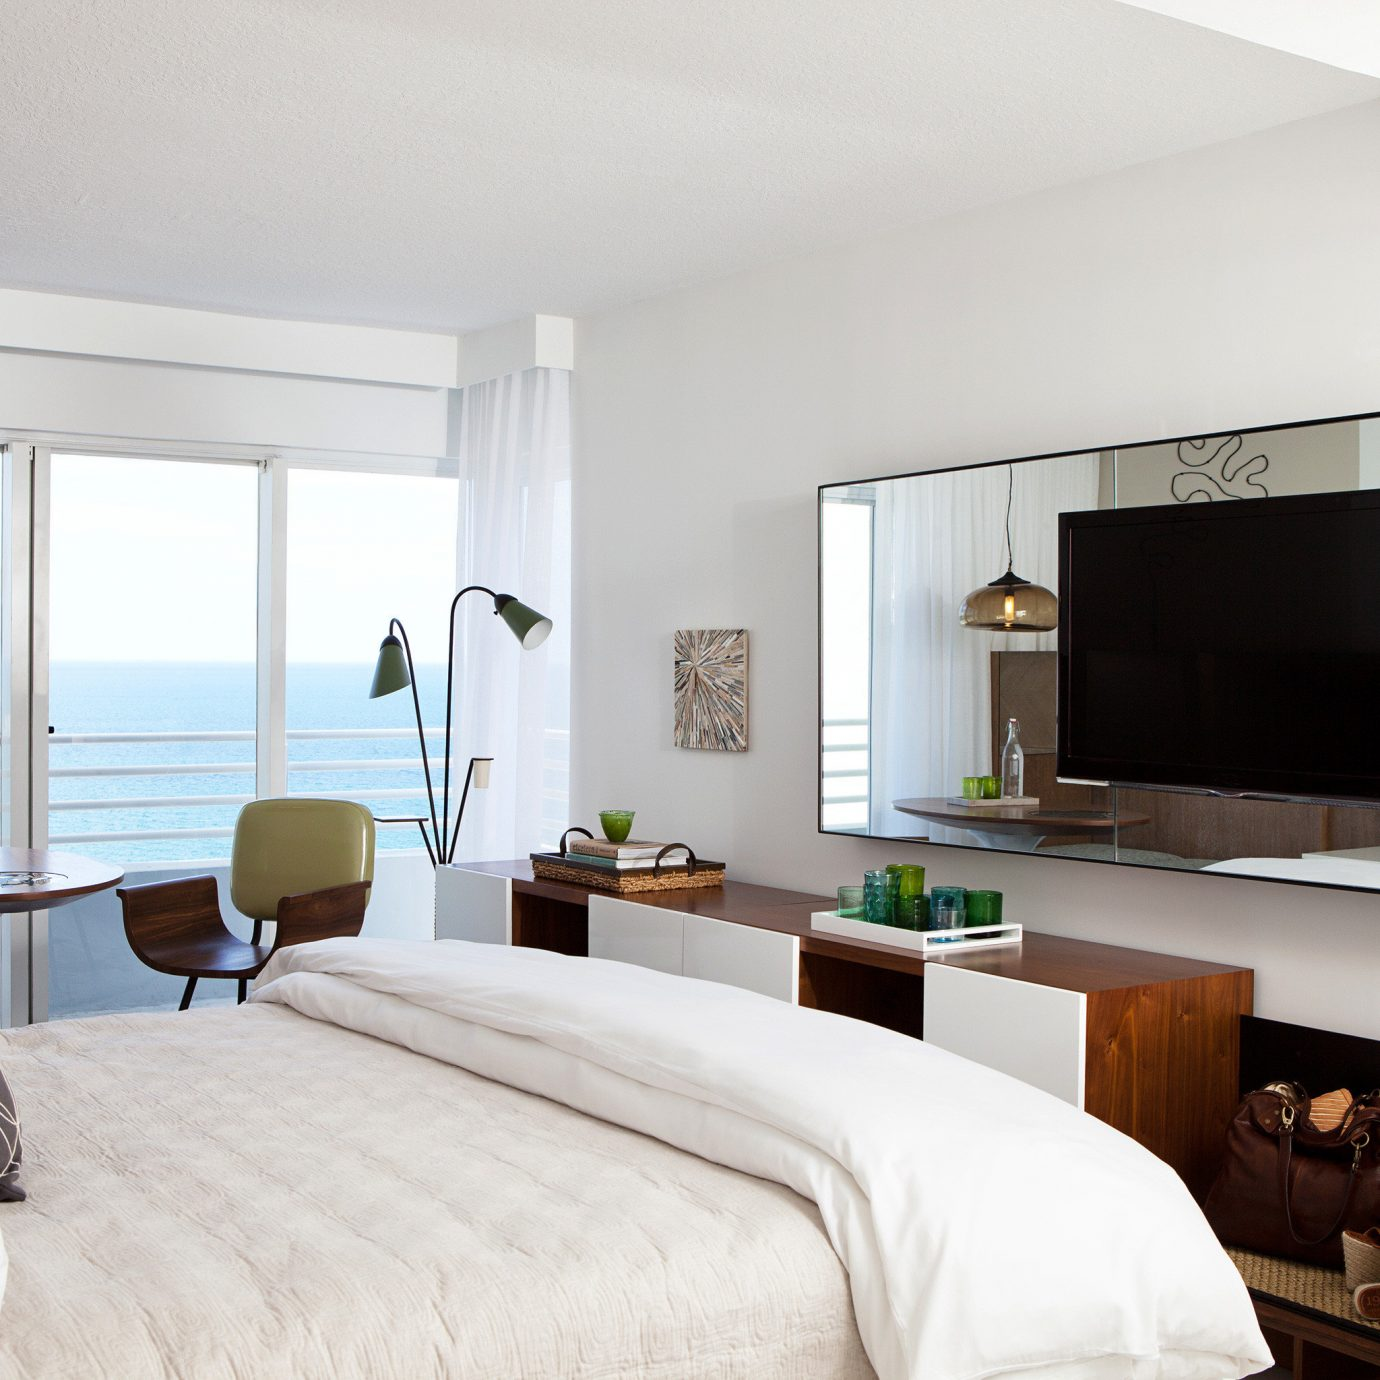 Balcony Bedroom Modern Scenic views Waterfront property living room home Suite cottage Villa condominium flat